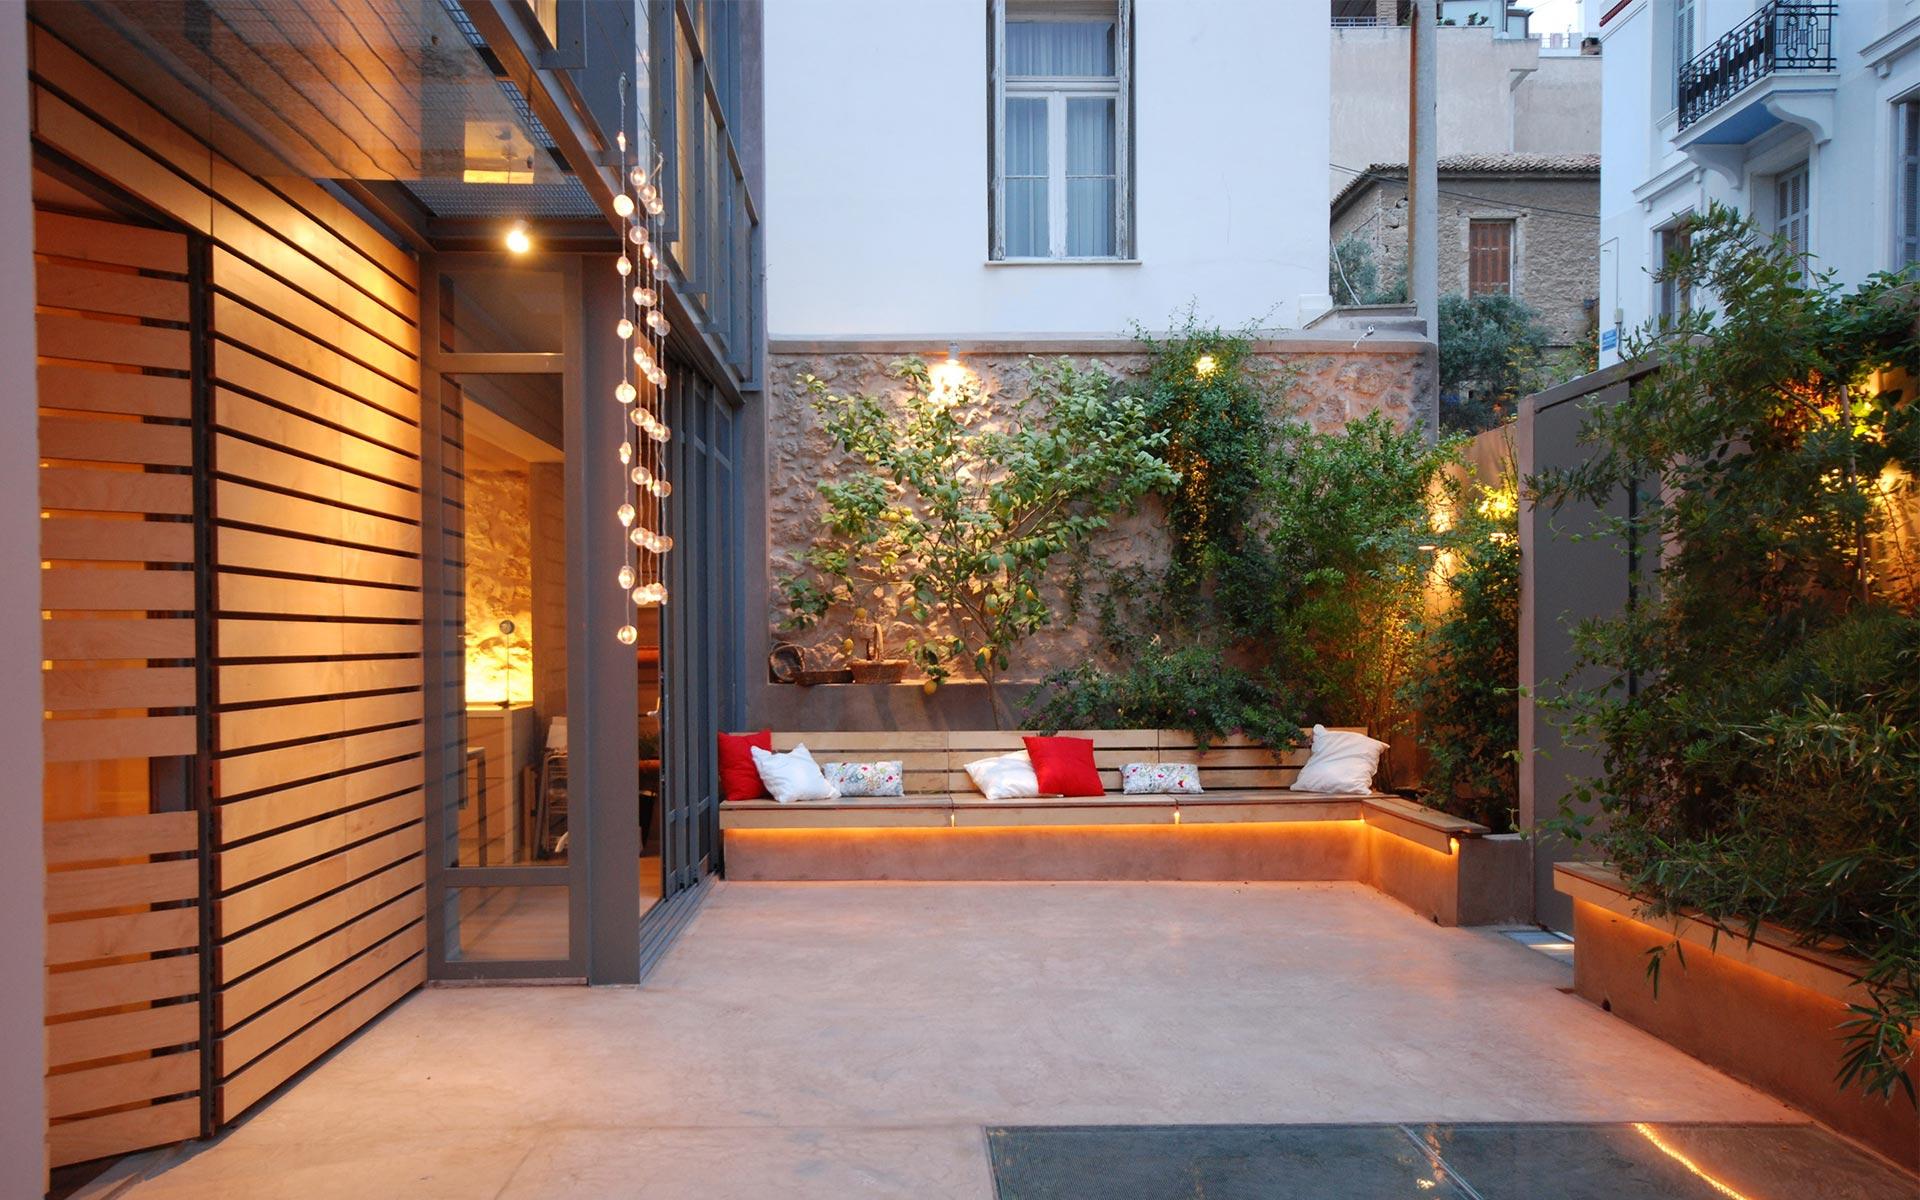 Z level elena zervoudakis - Como decorar un piso pequeno moderno ...